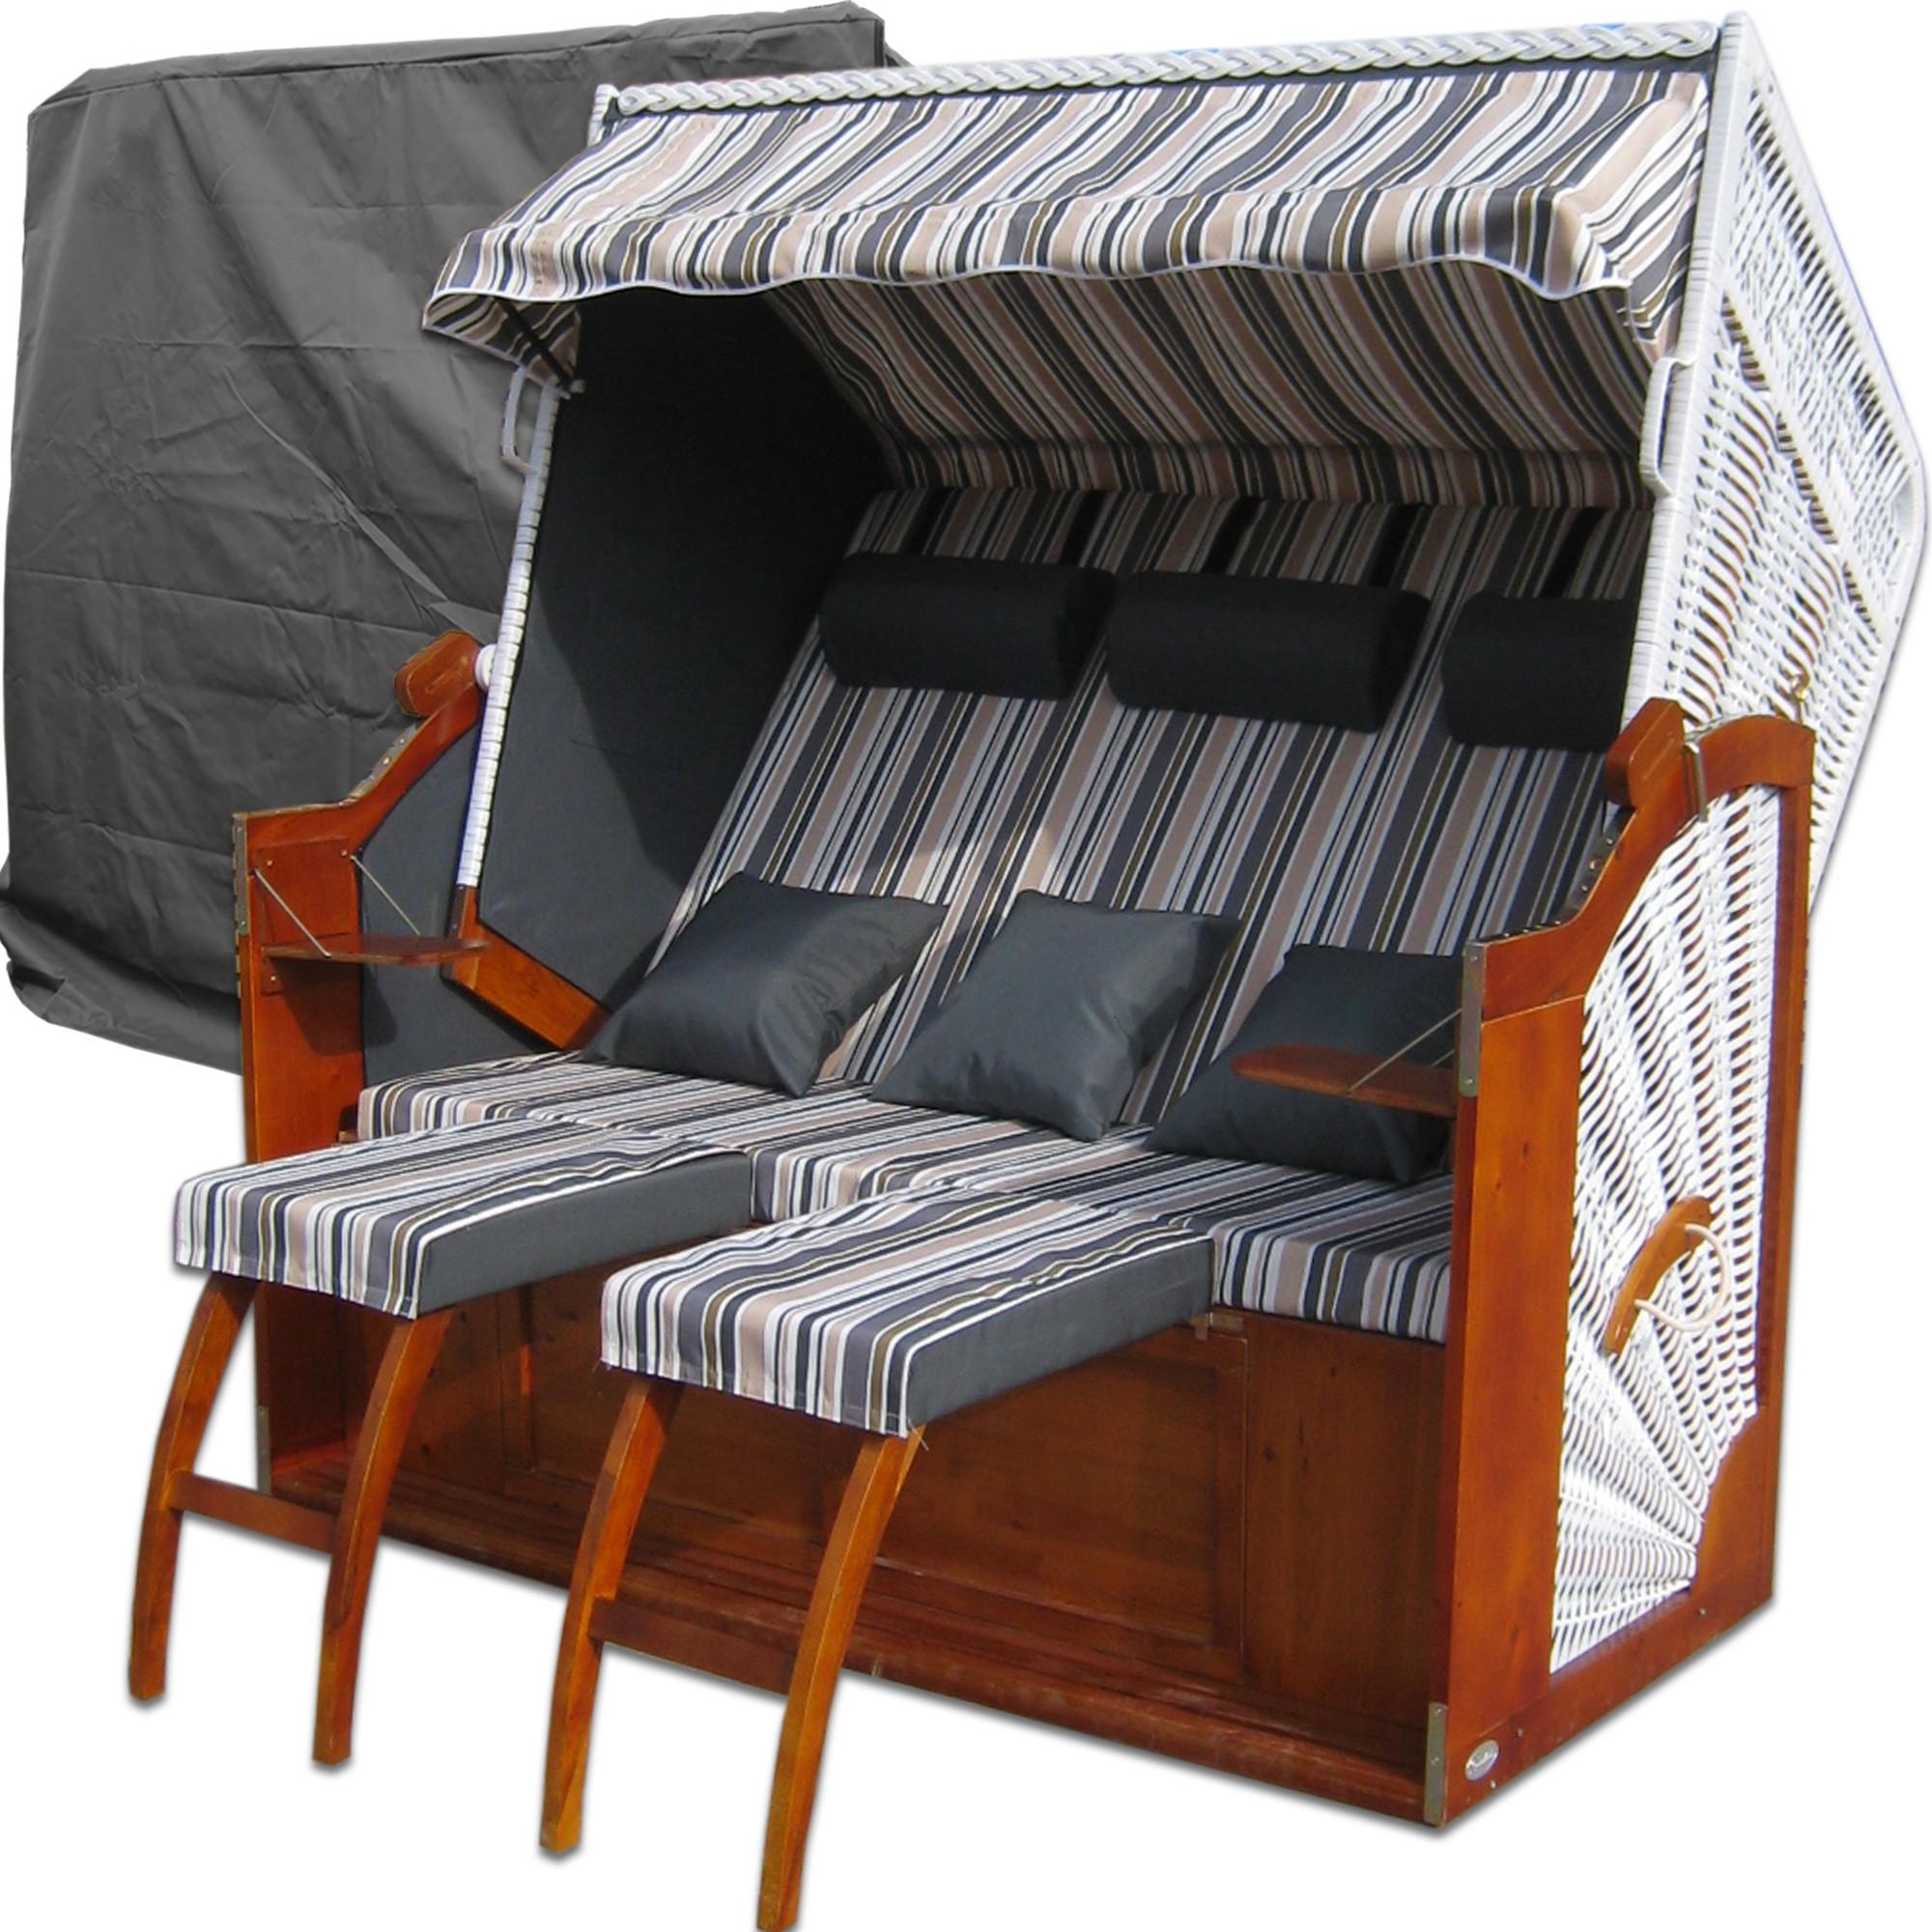 strandkorb xxxl weiss grau g nstig strandkorb xxl kaufen. Black Bedroom Furniture Sets. Home Design Ideas